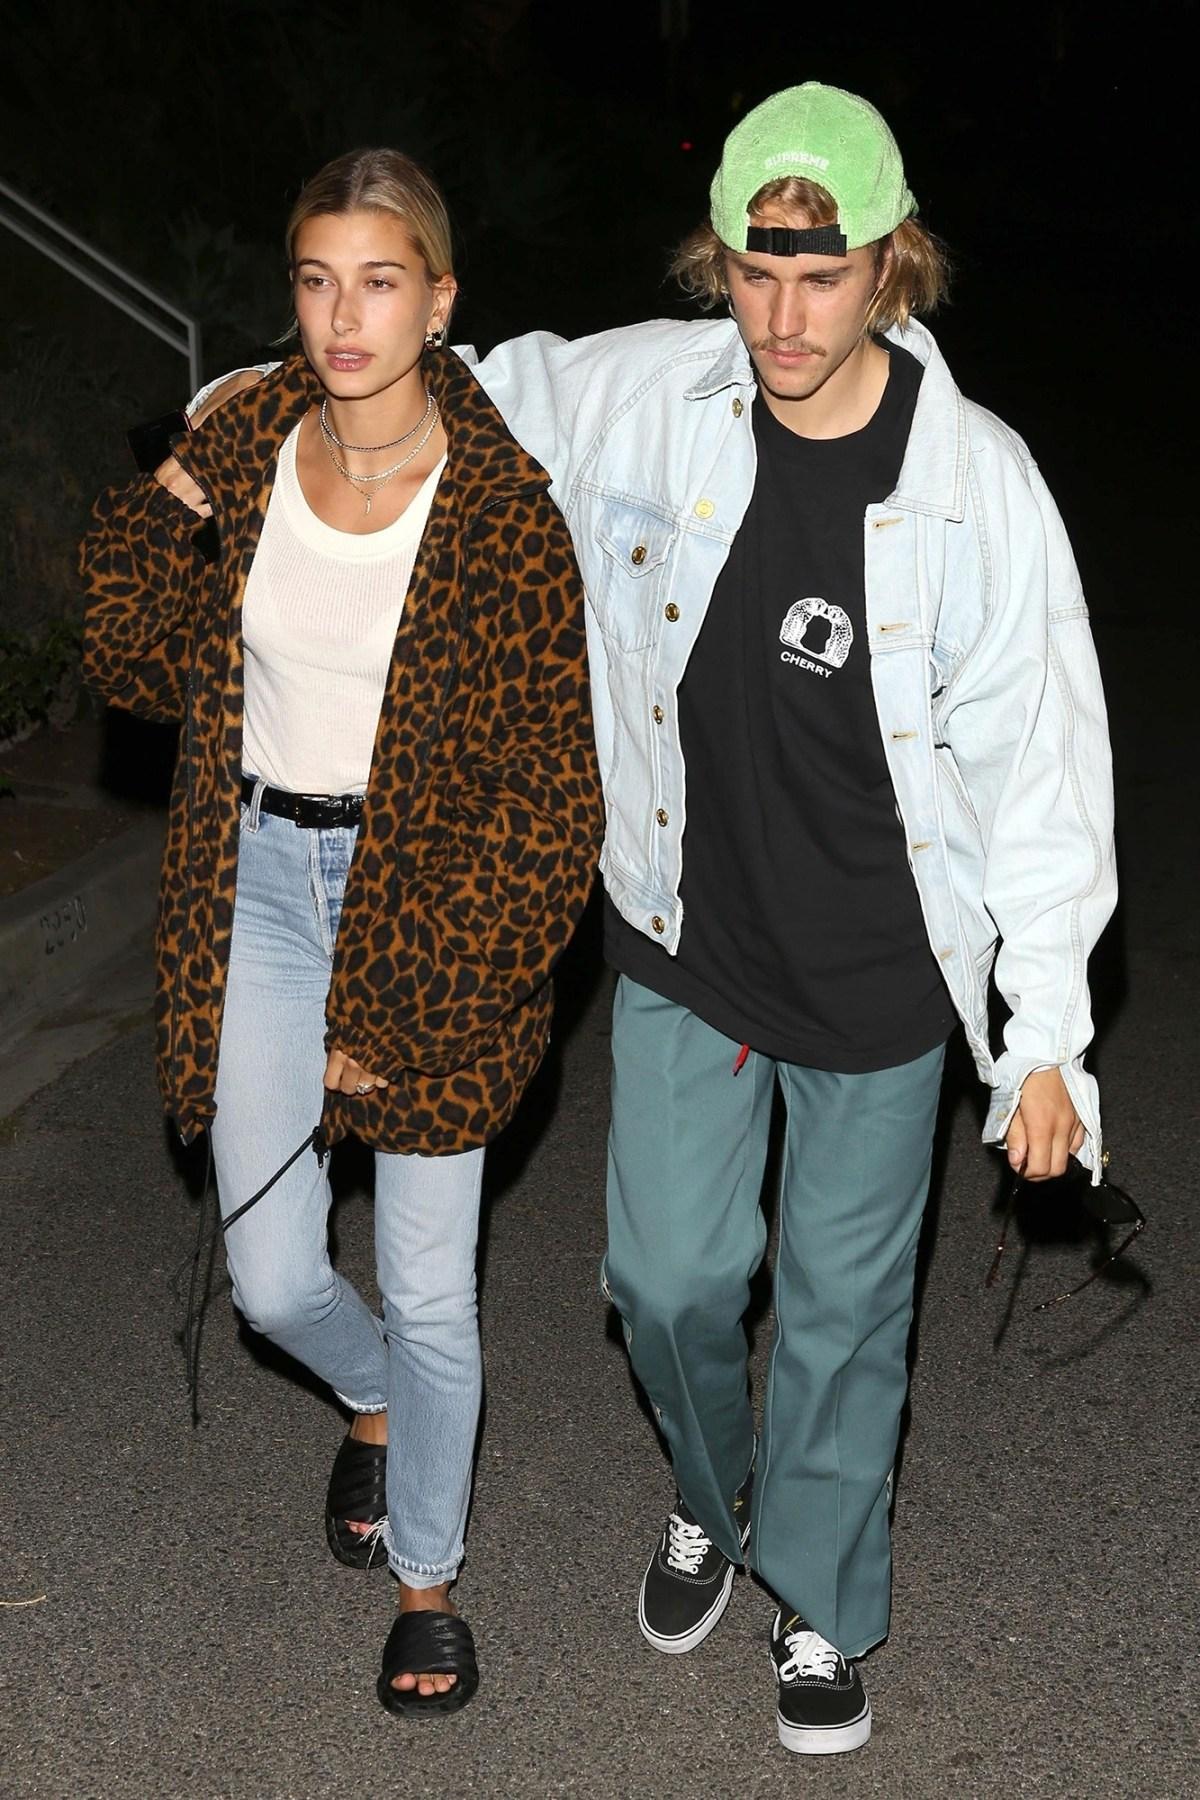 67d32d5325d Justin Bieber and Hailey Baldwin s Best Couples Fashion Moments  Pics